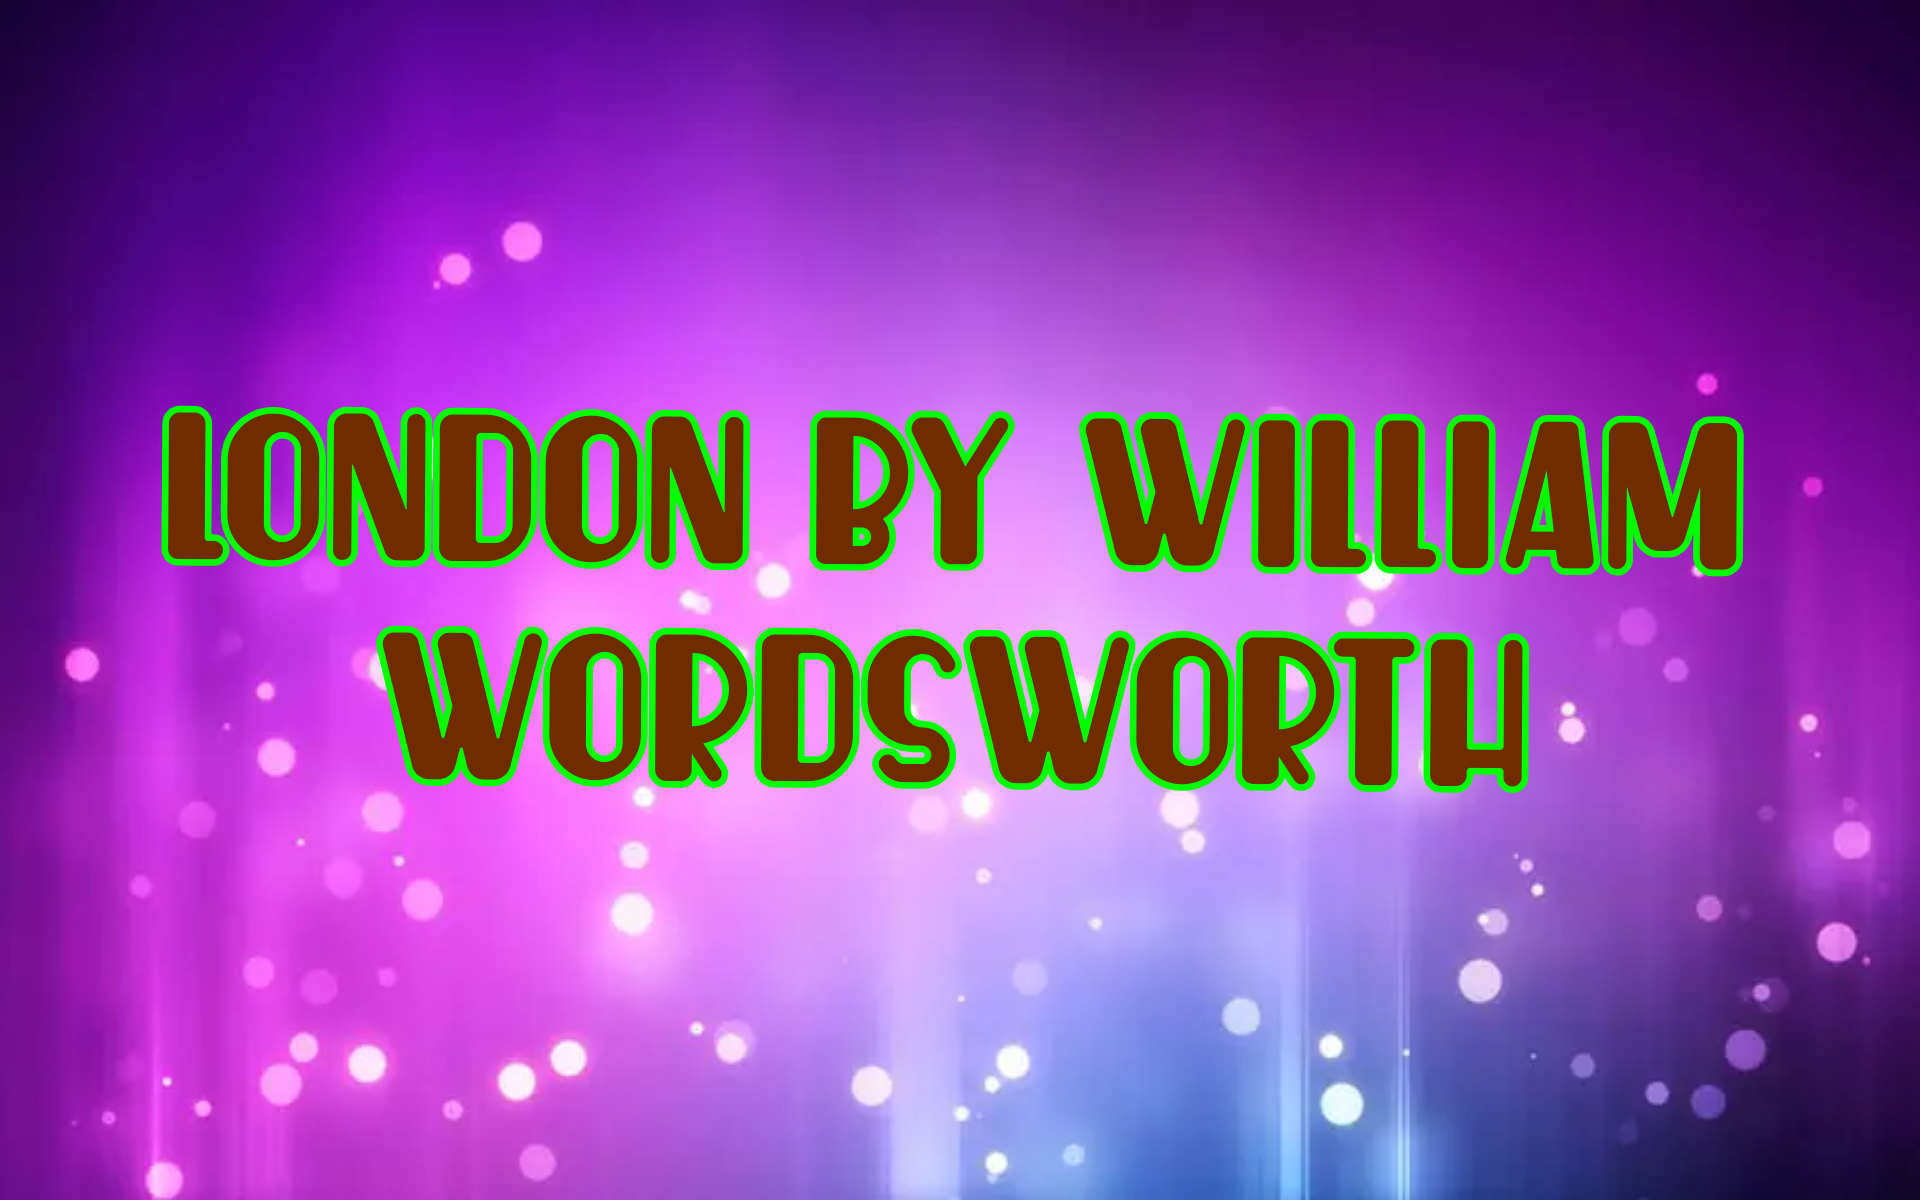 London, 1802 By William Wordsworth Summary 3